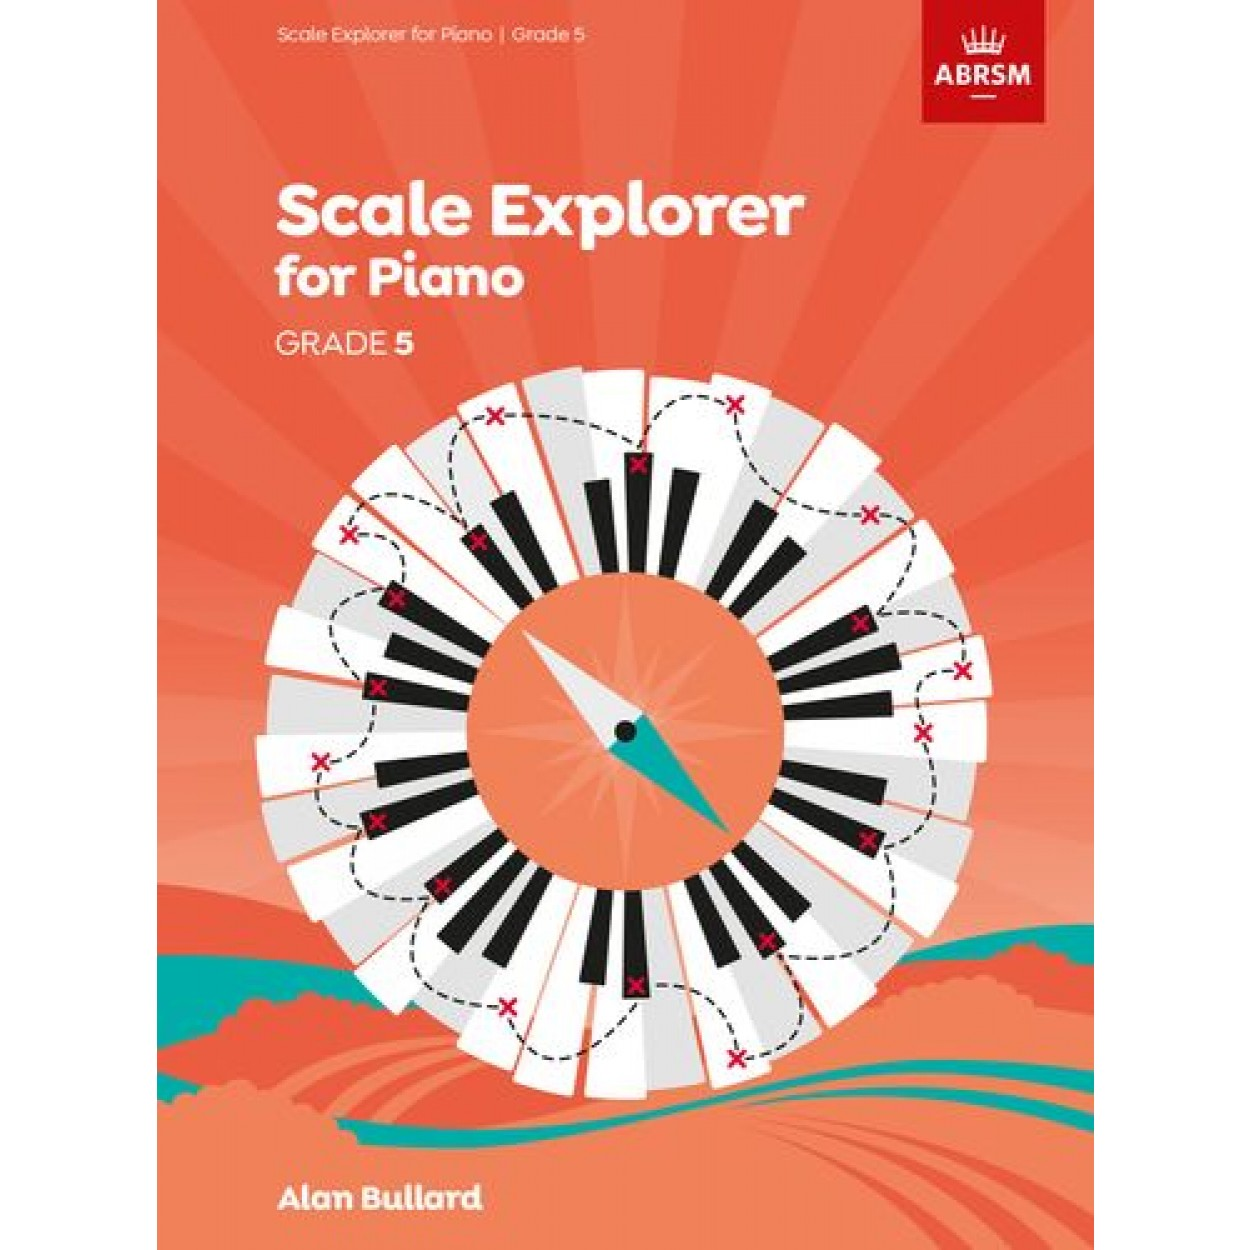 Scale Explorer for Piano Grade 5 available at Penarth Music Centre